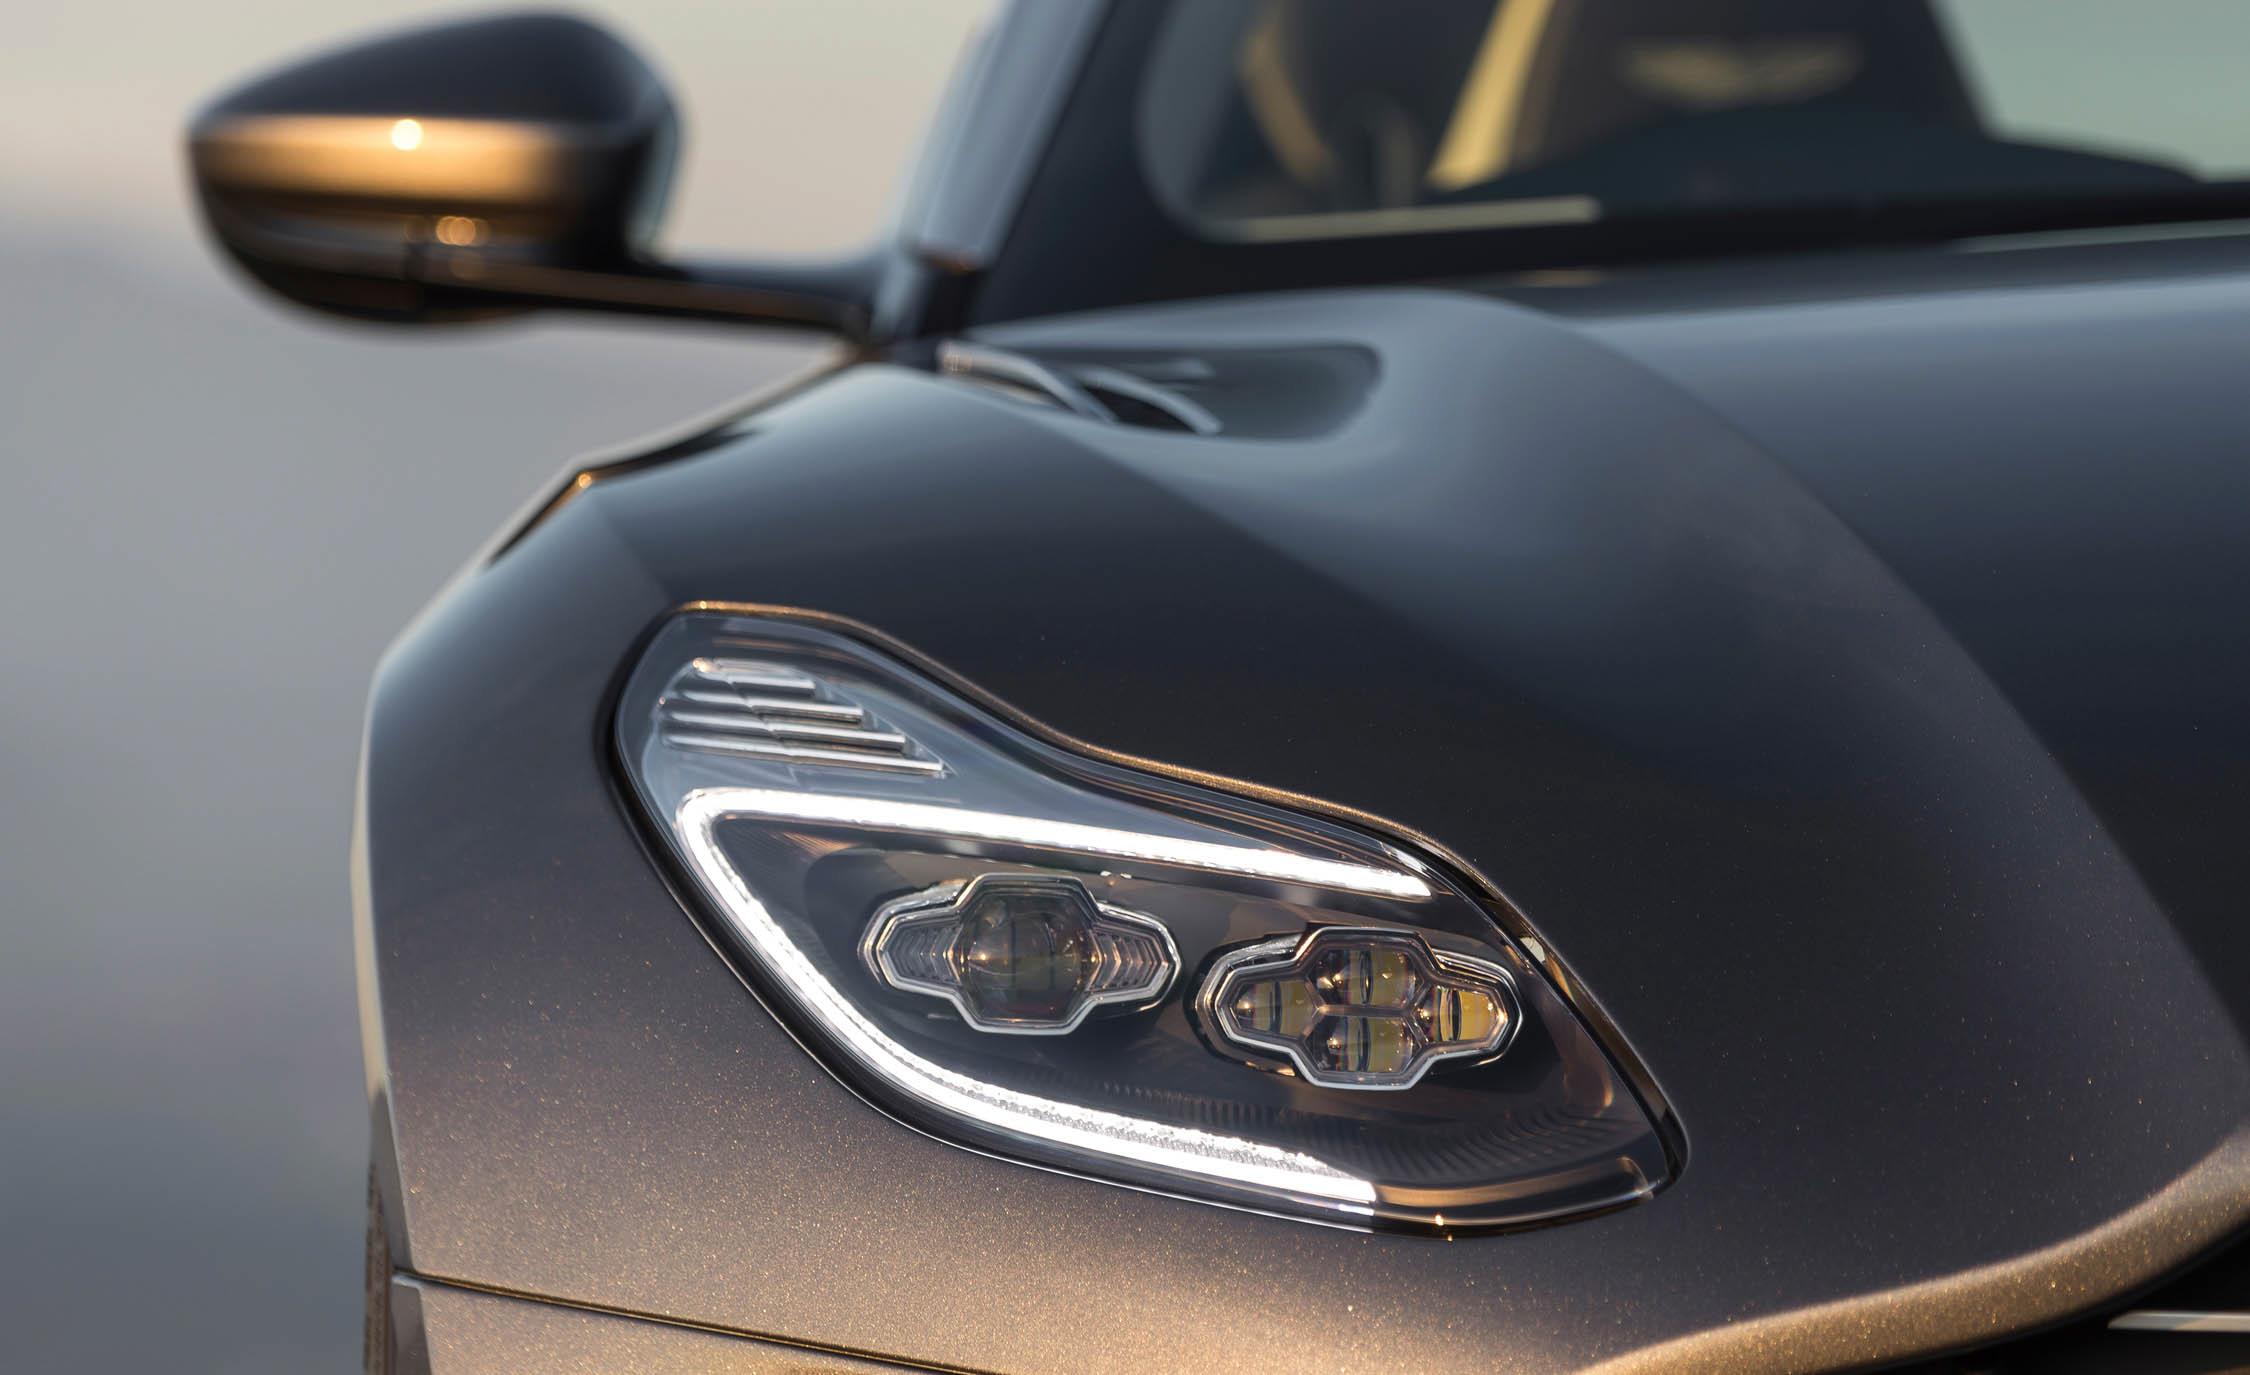 2017 Aston Martin Db11 Exterior Headlamp (View 22 of 22)